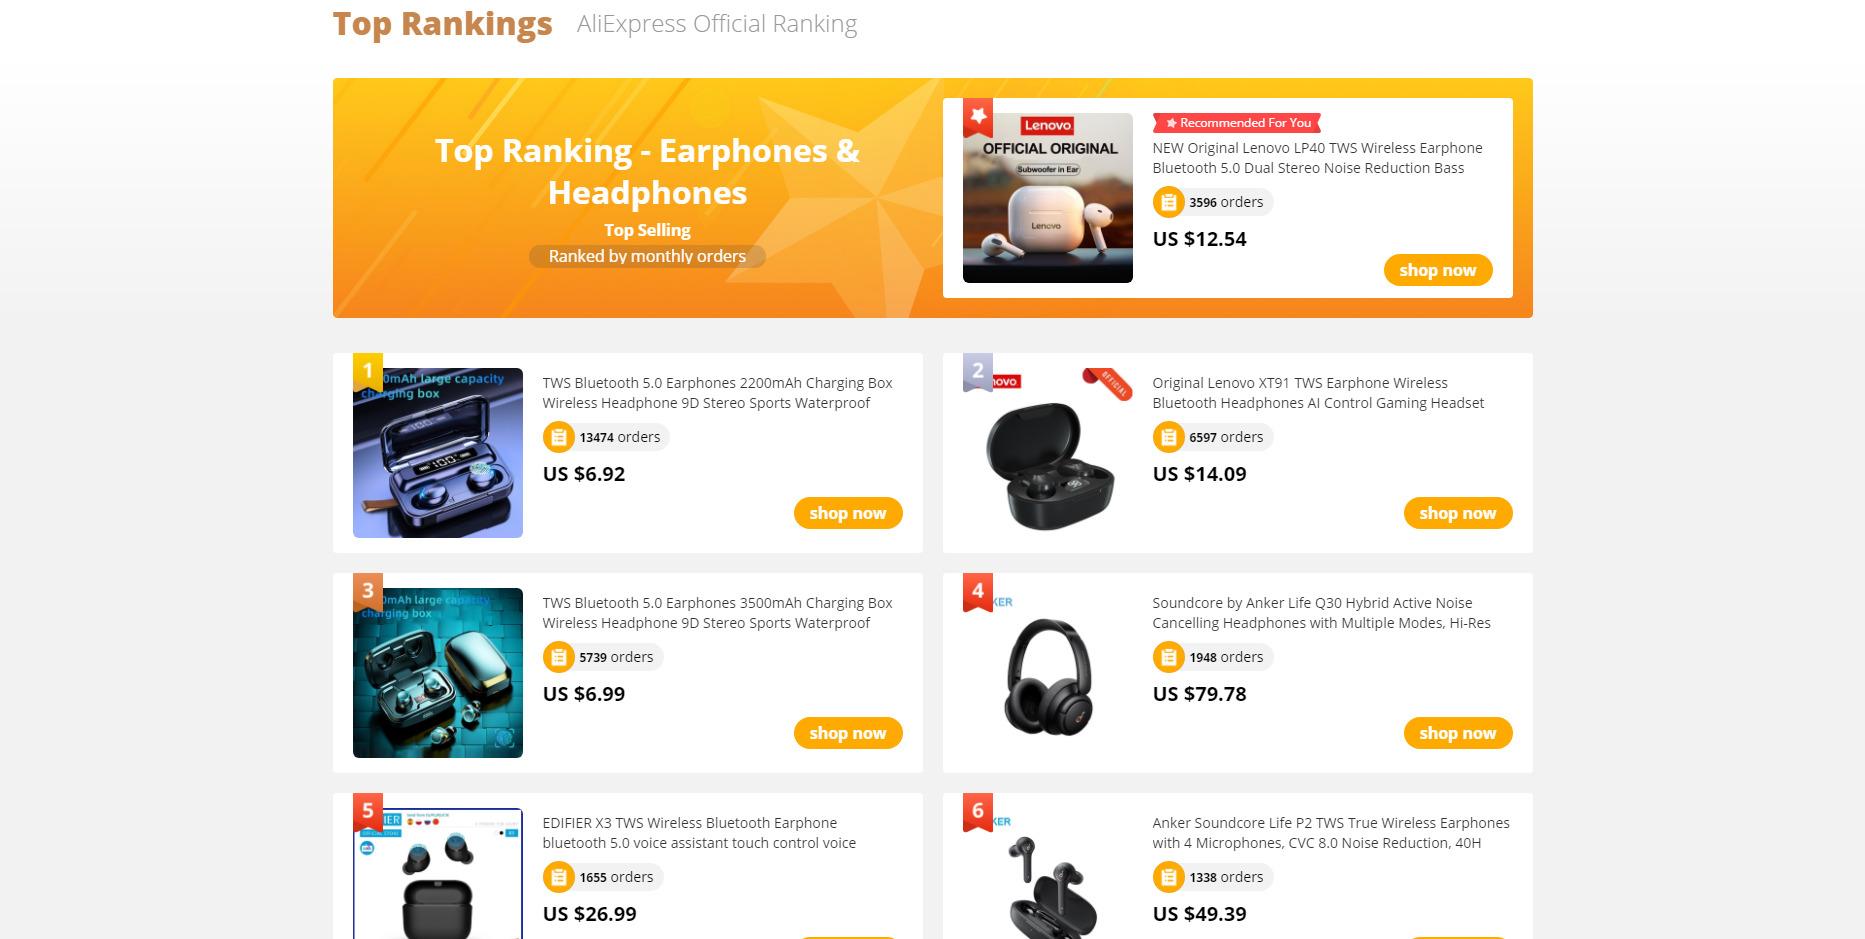 Aliexpress Top Ranking